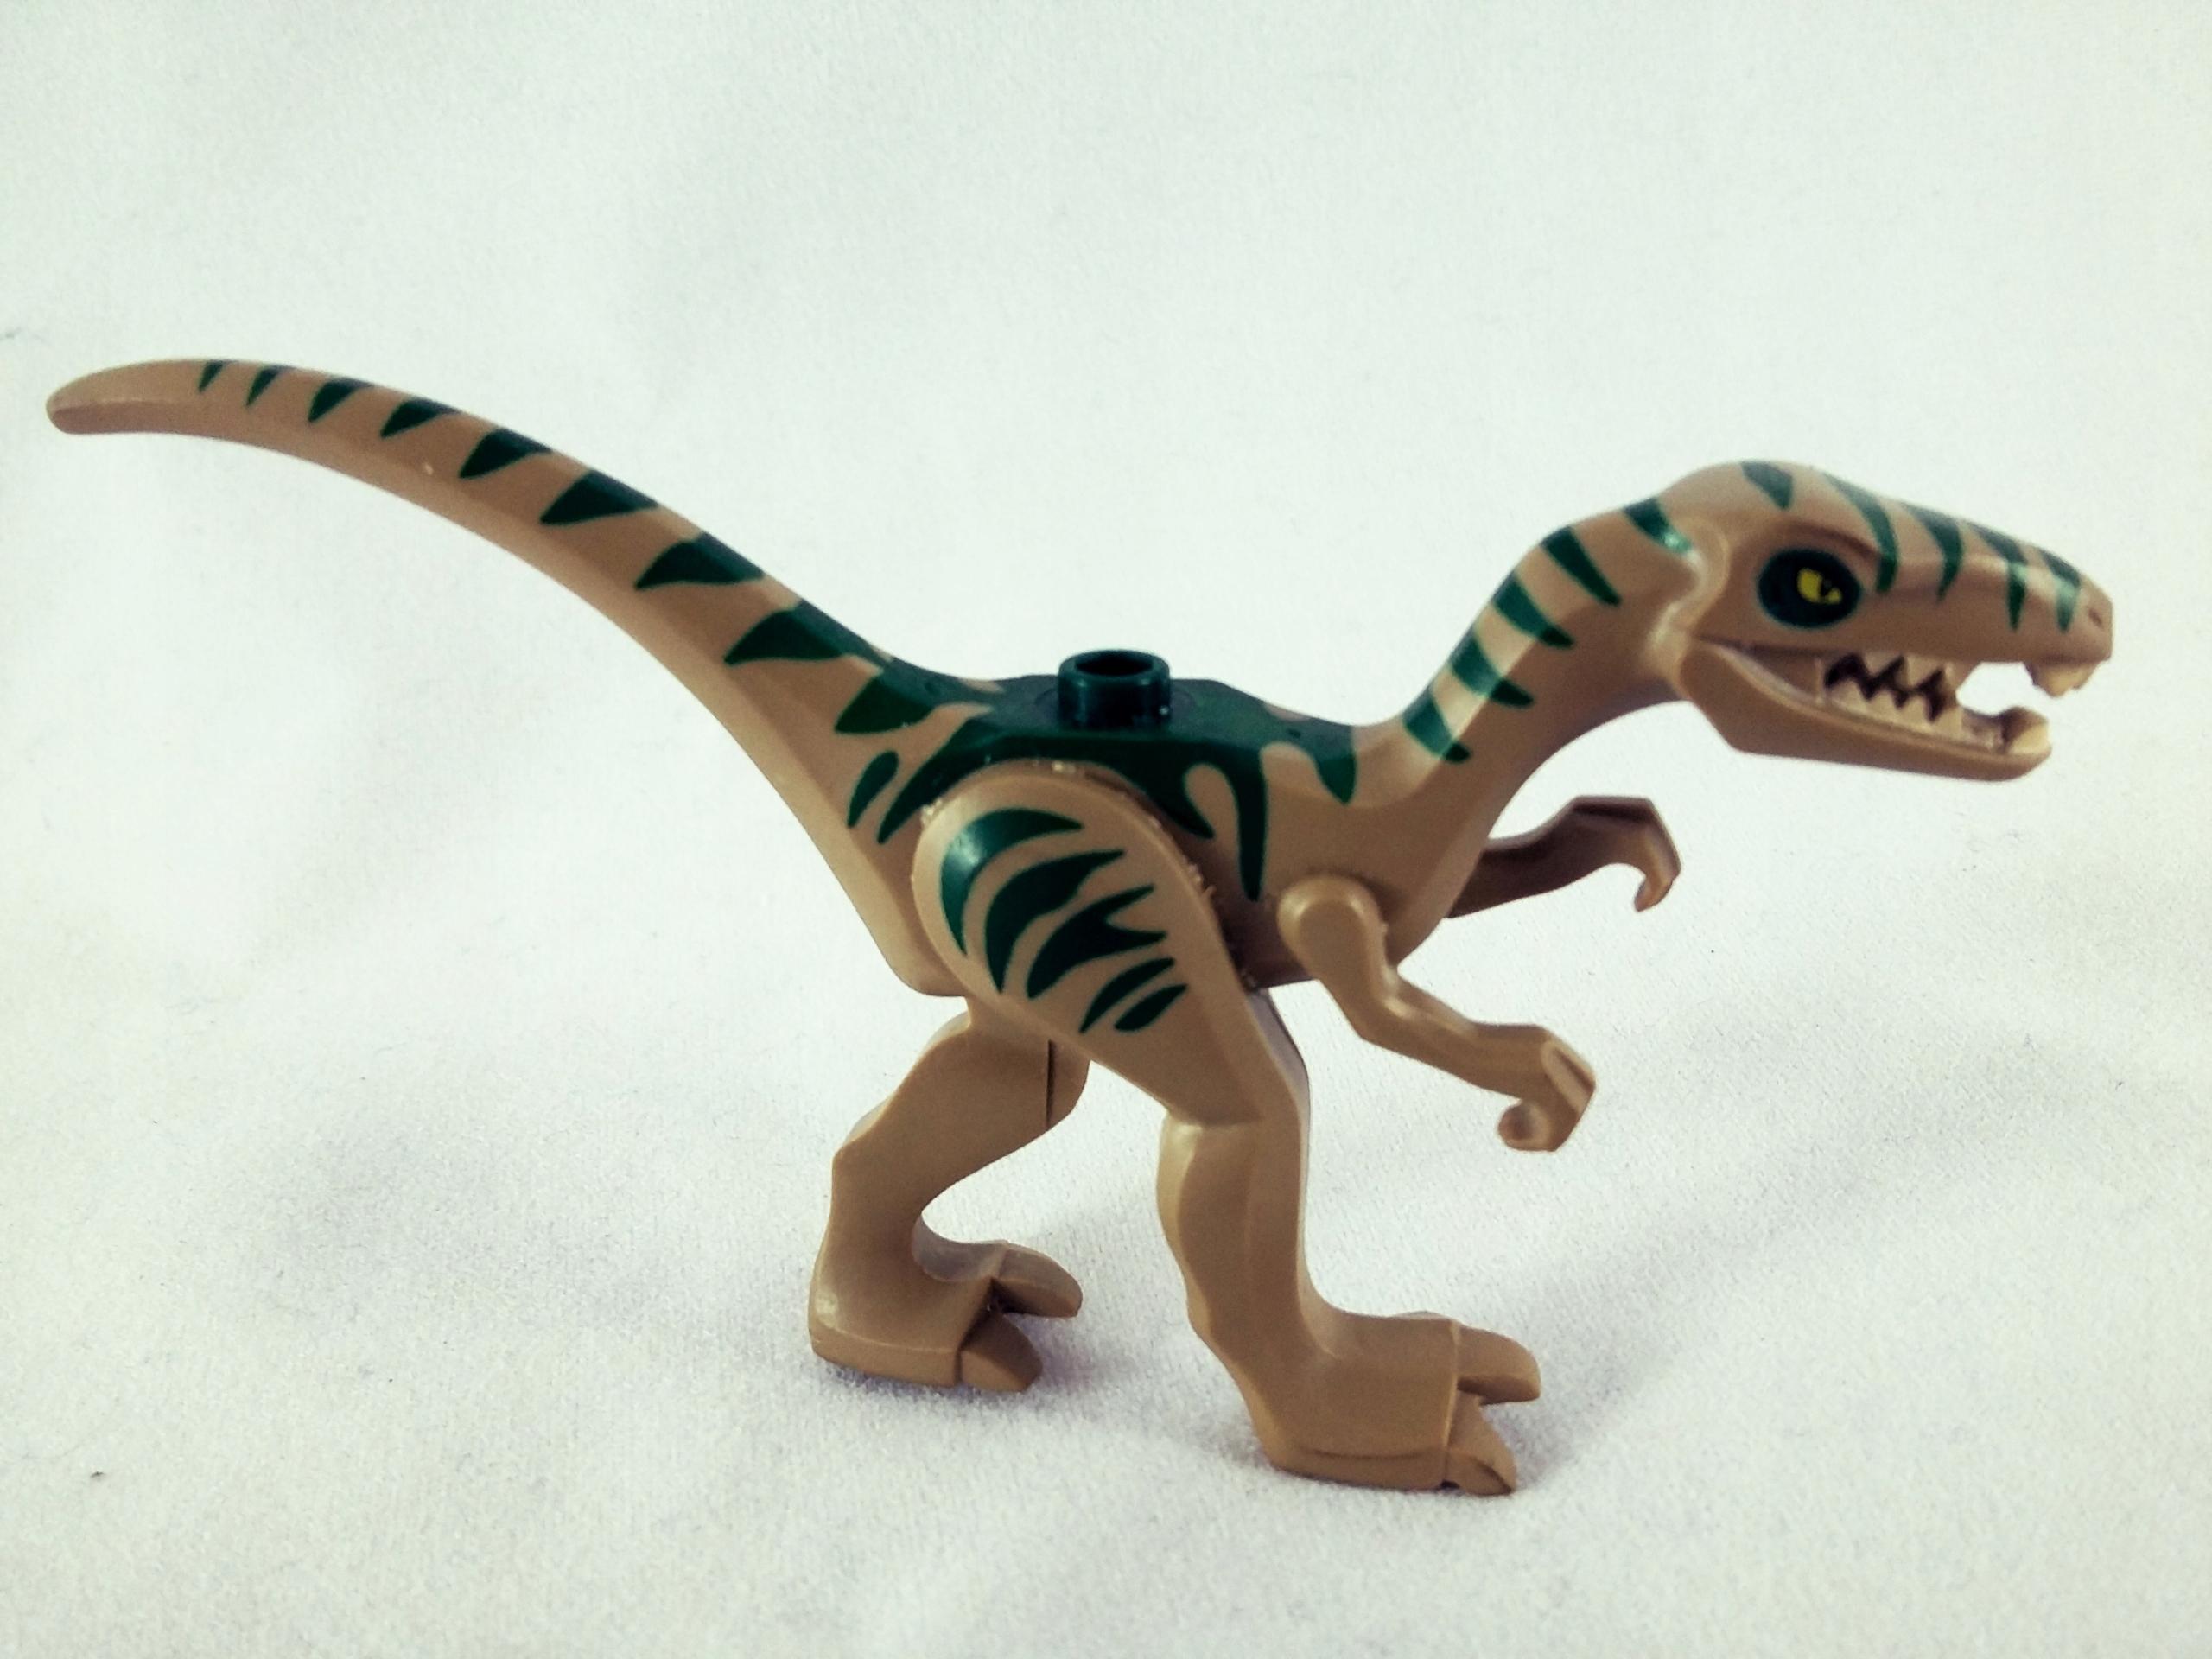 Figurka Lego Dino Dinozaur Celofyz Coelophysis